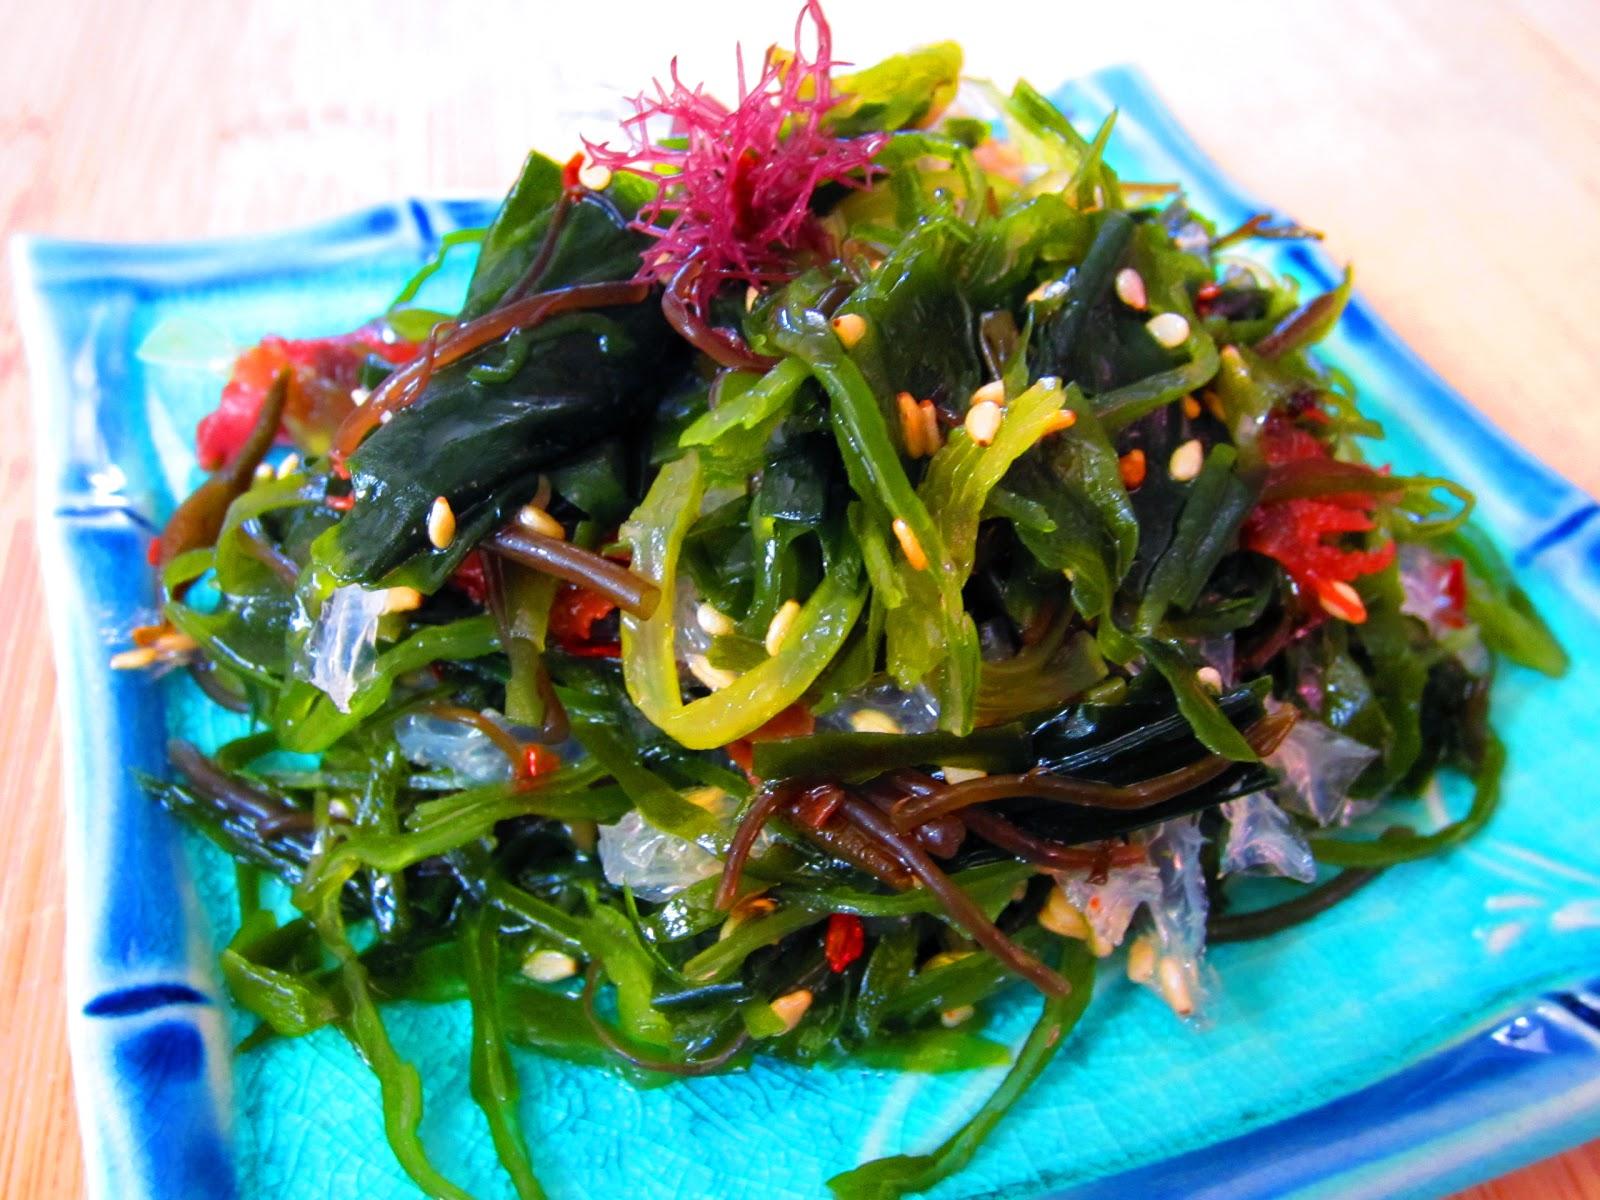 Как сделать жареную морскую капусту